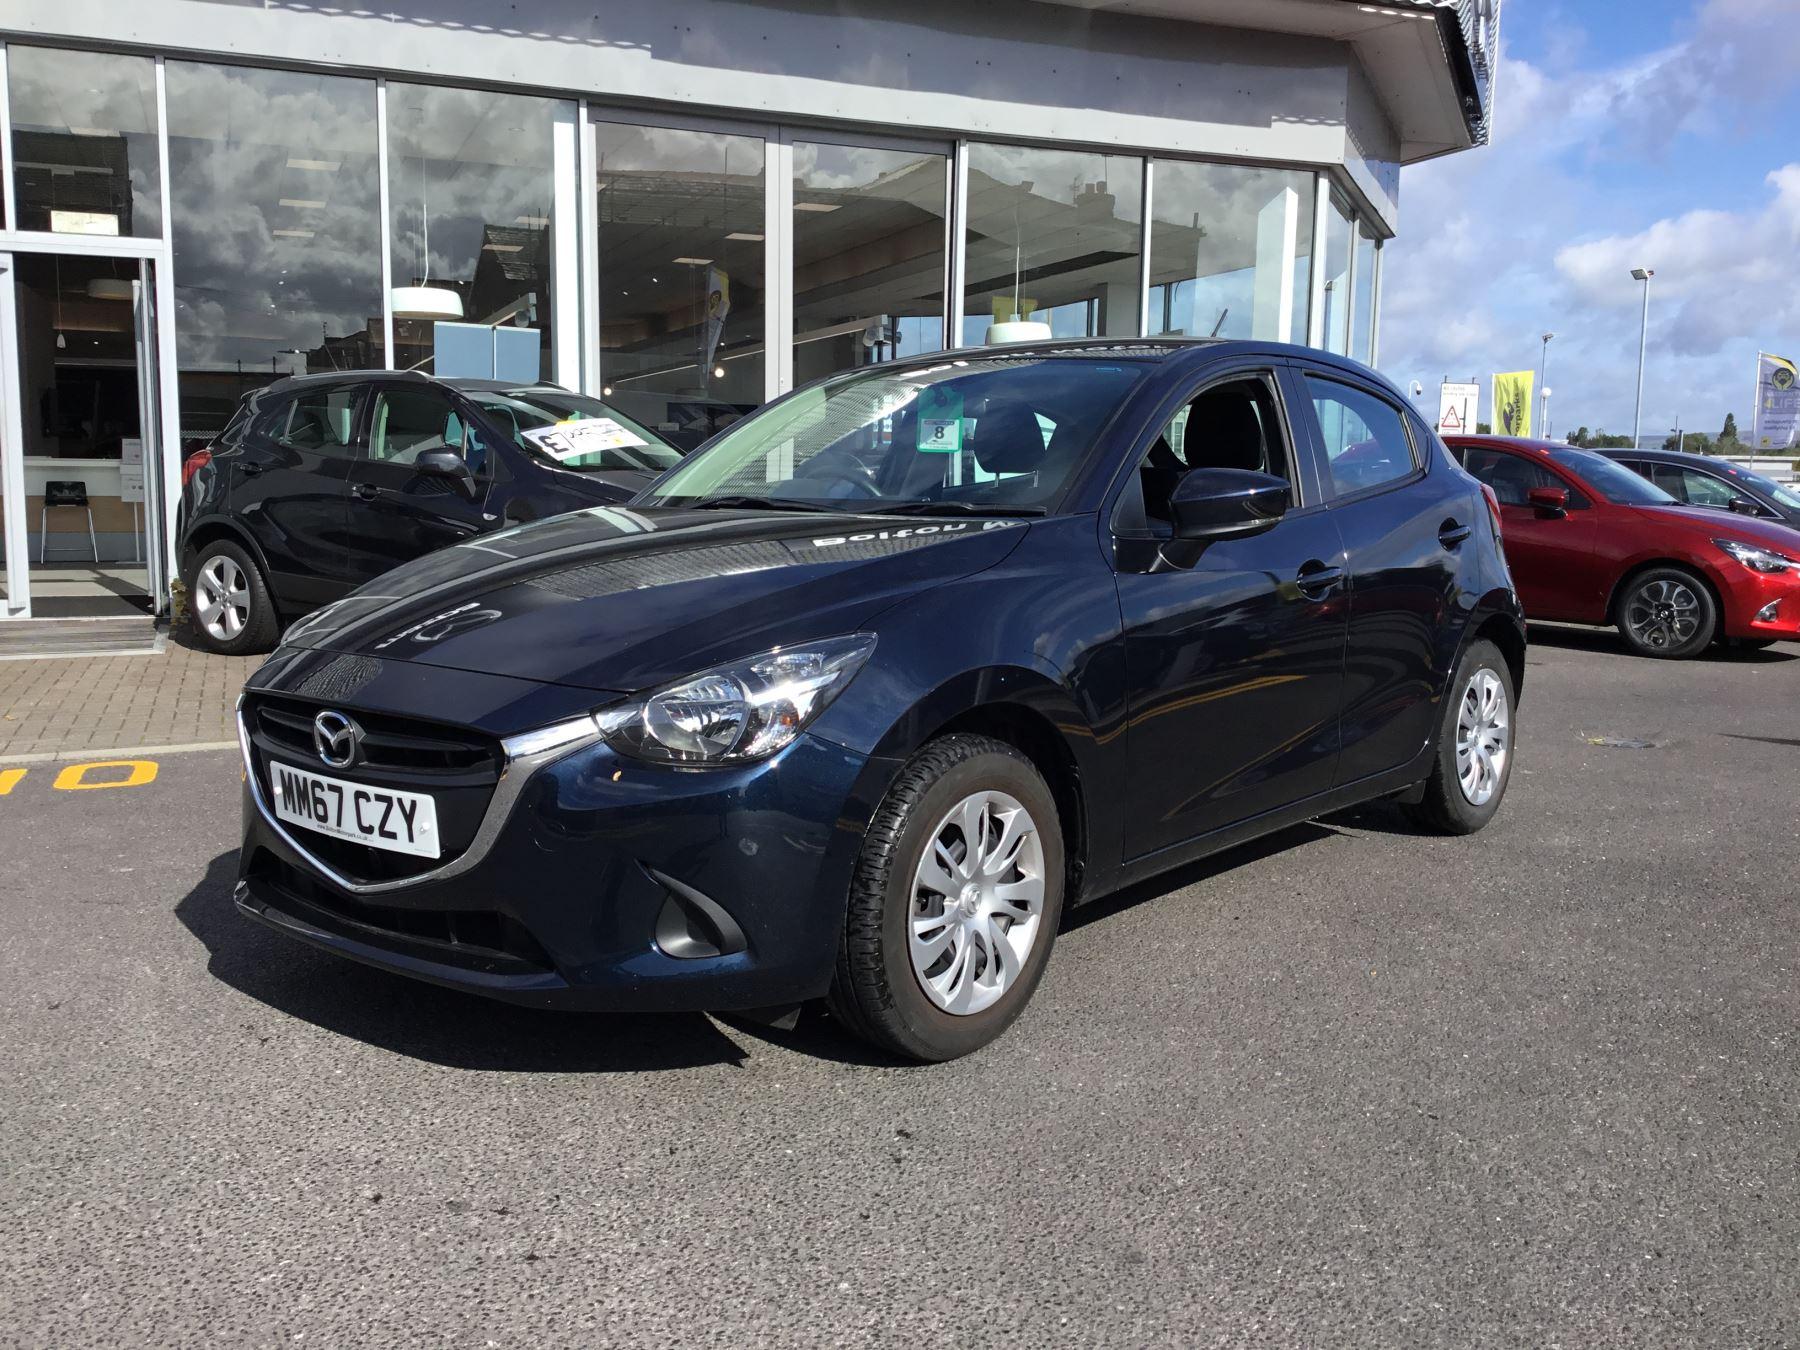 Mazda 2 1.5 75 SE 5dr image 3